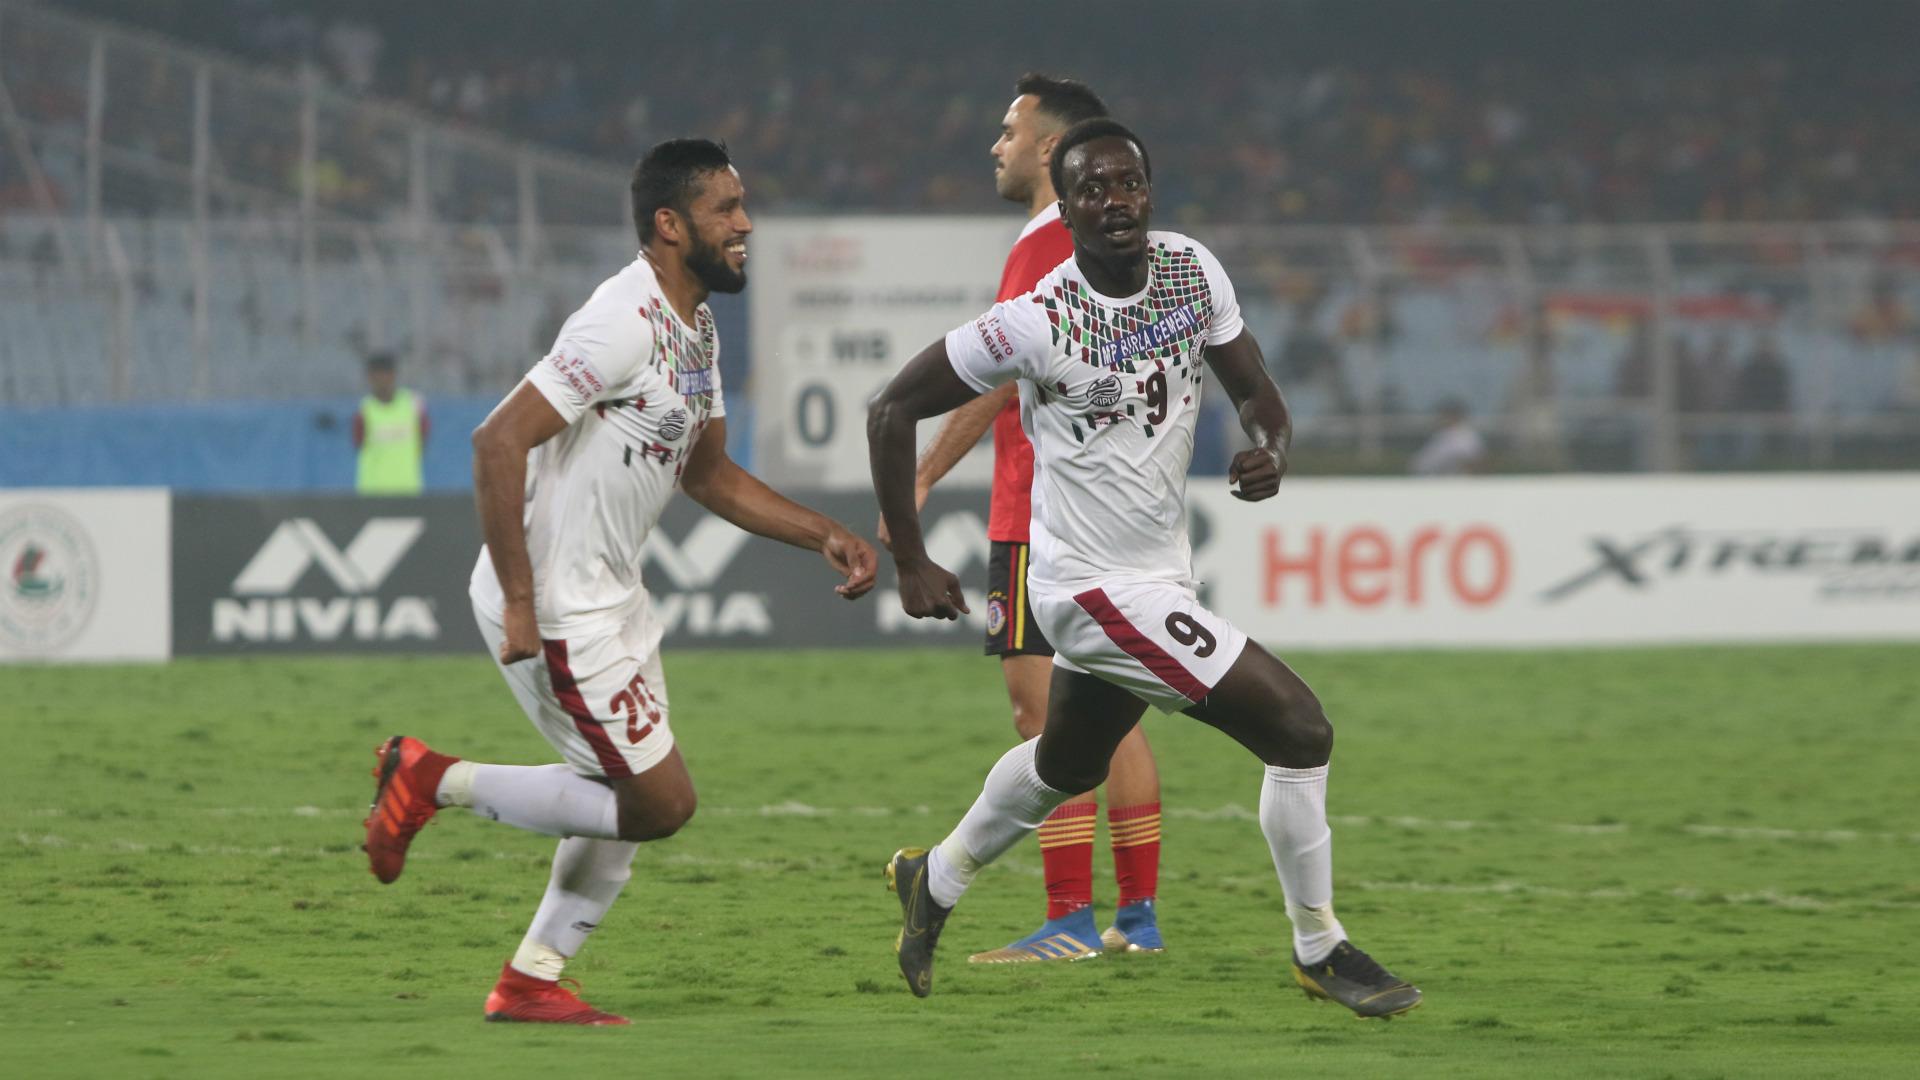 Baba Diawara Mohun Bagan East Bengal I-League 2019-20